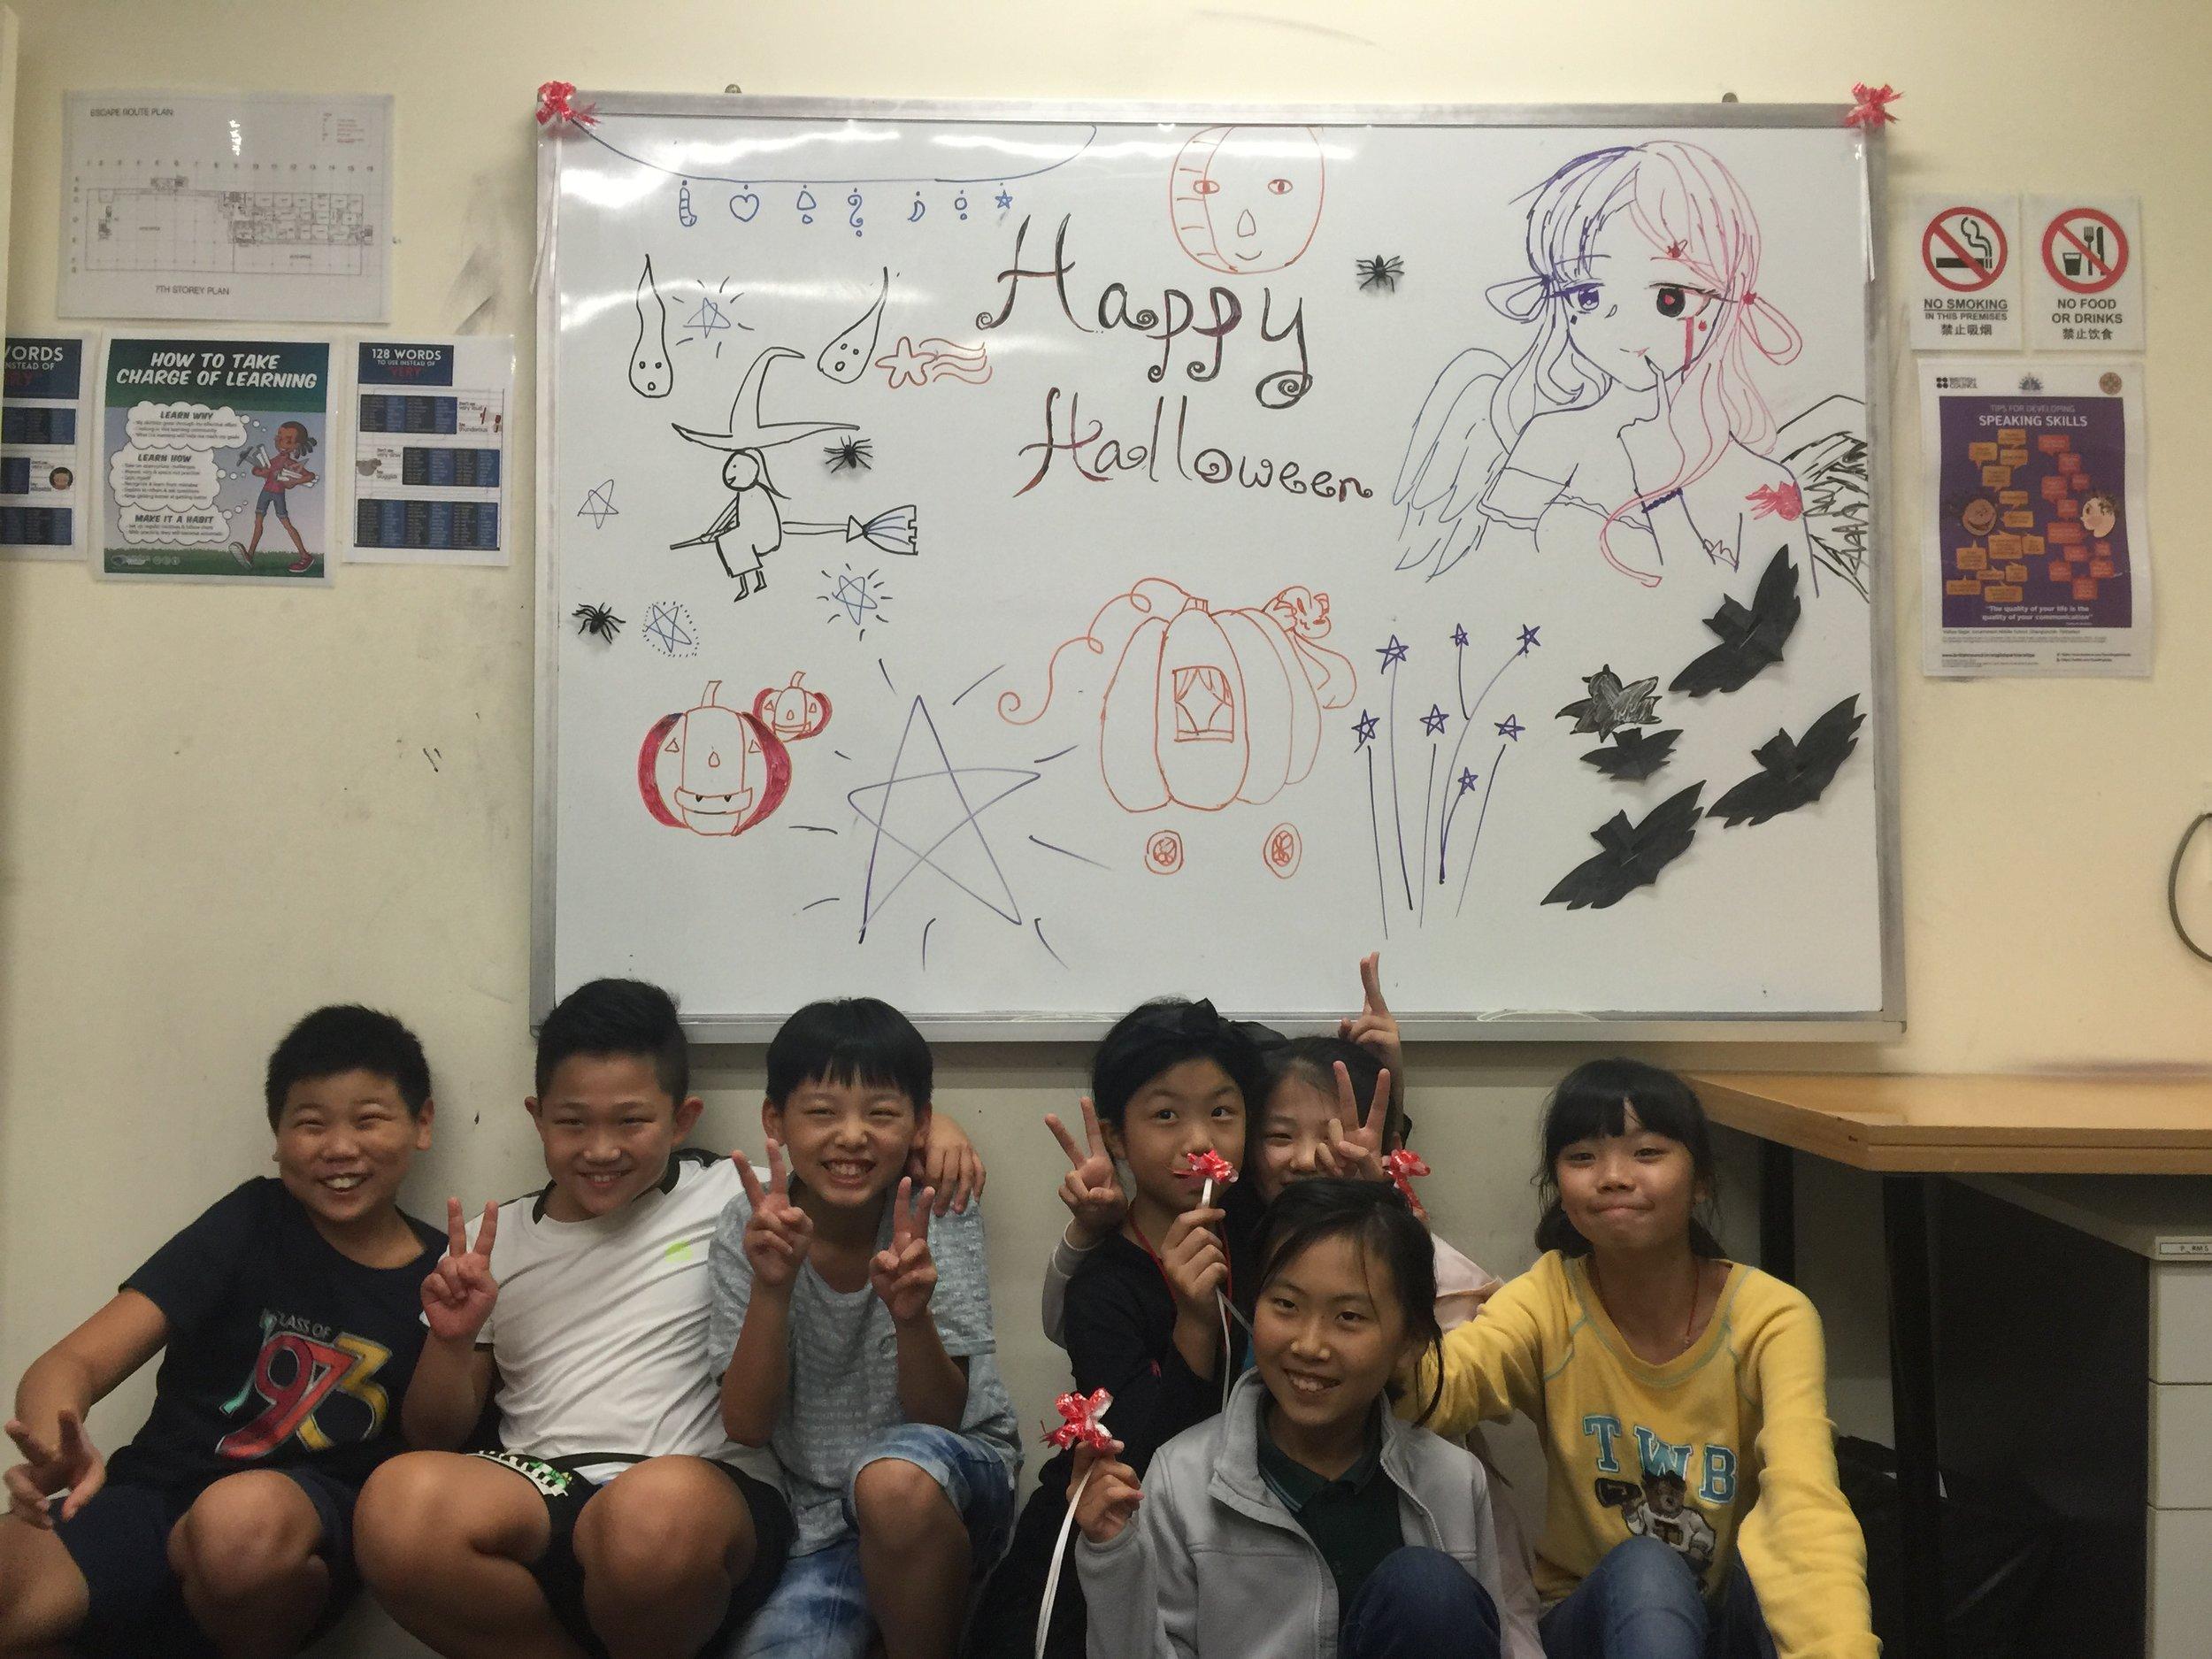 Happy Halloween_P5 Math class (3).JPG